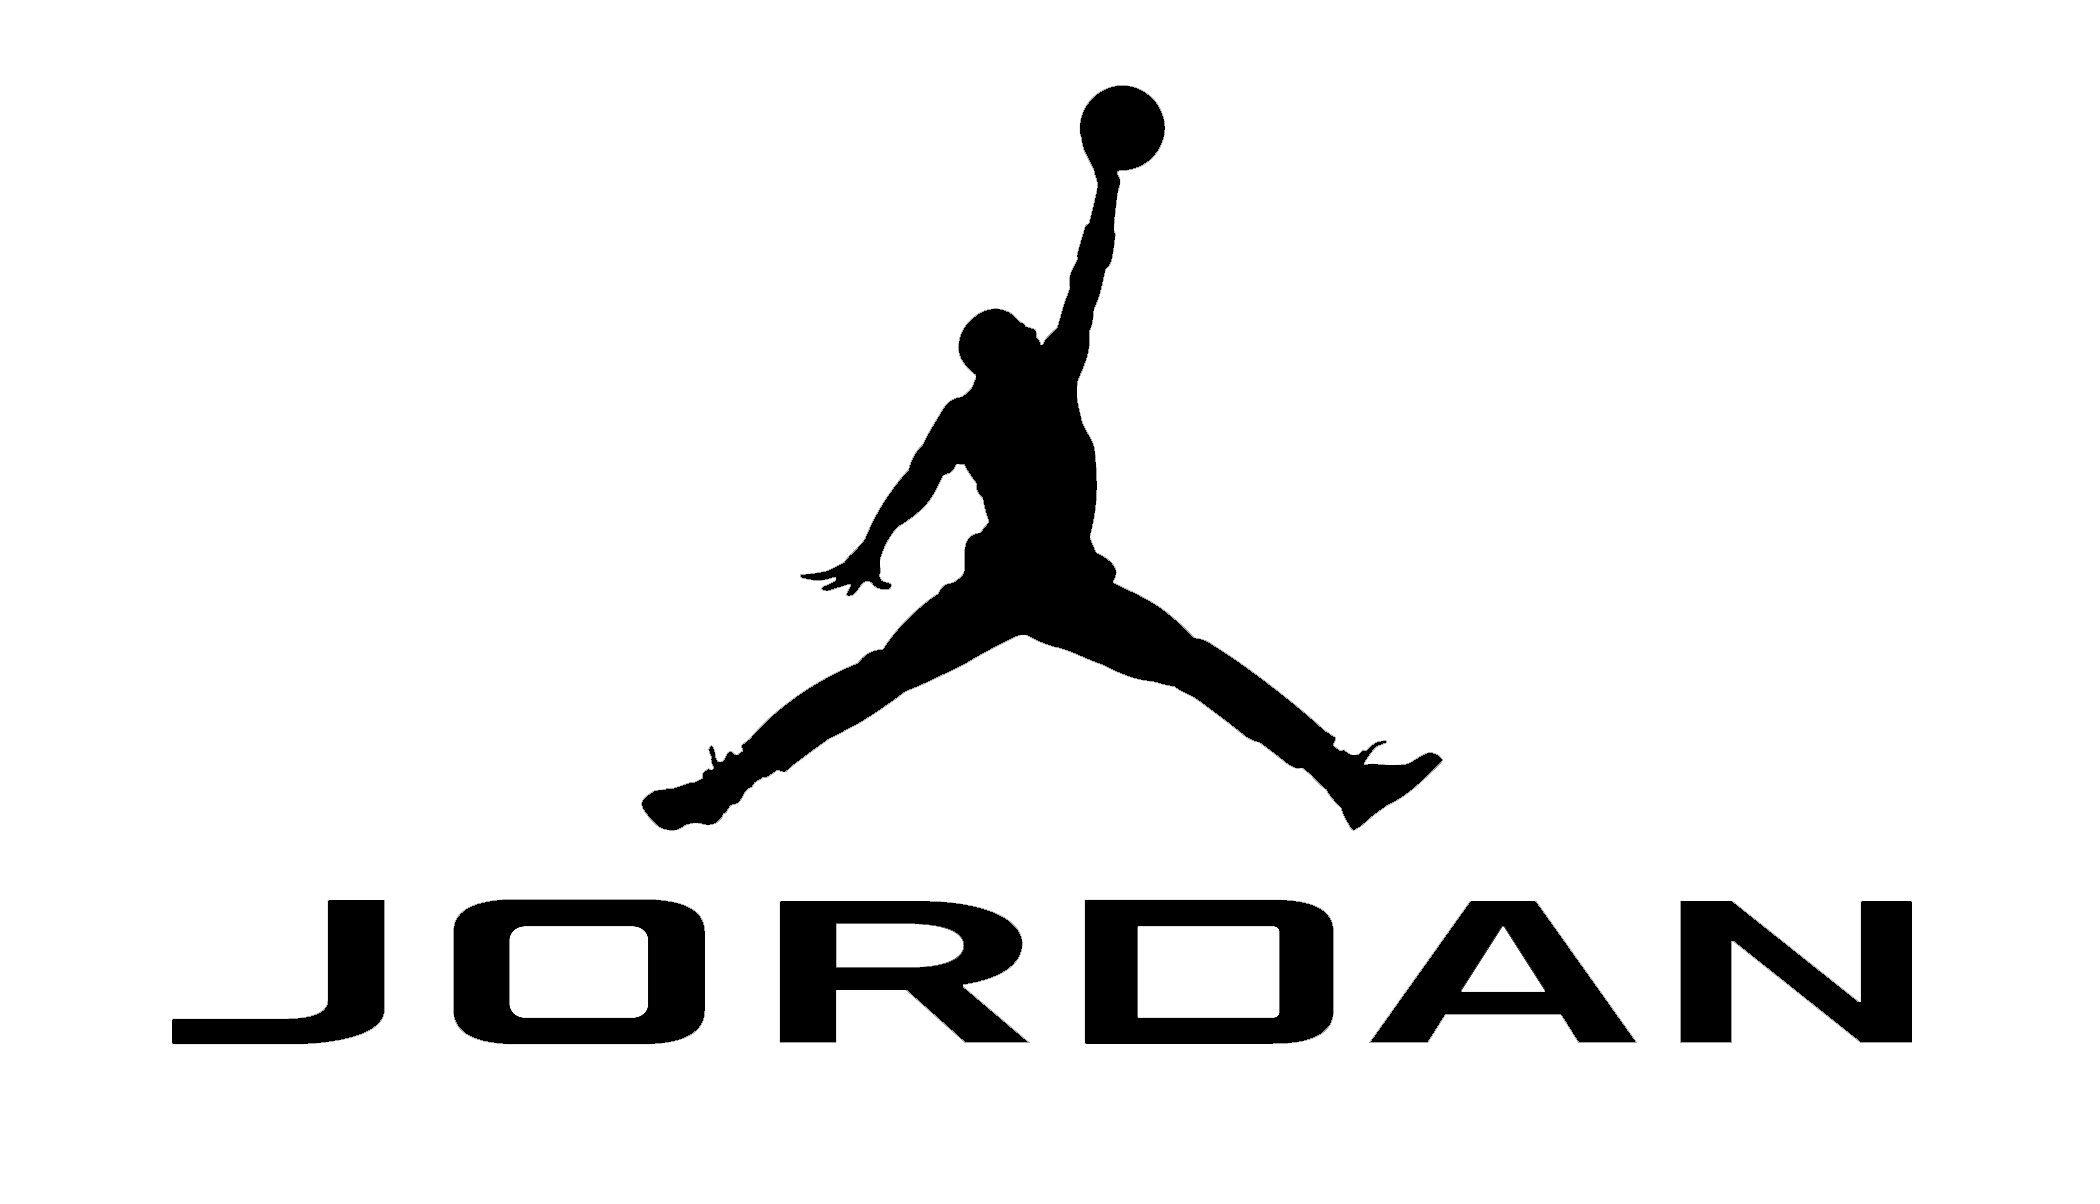 Jordan Logo Clipart #1.